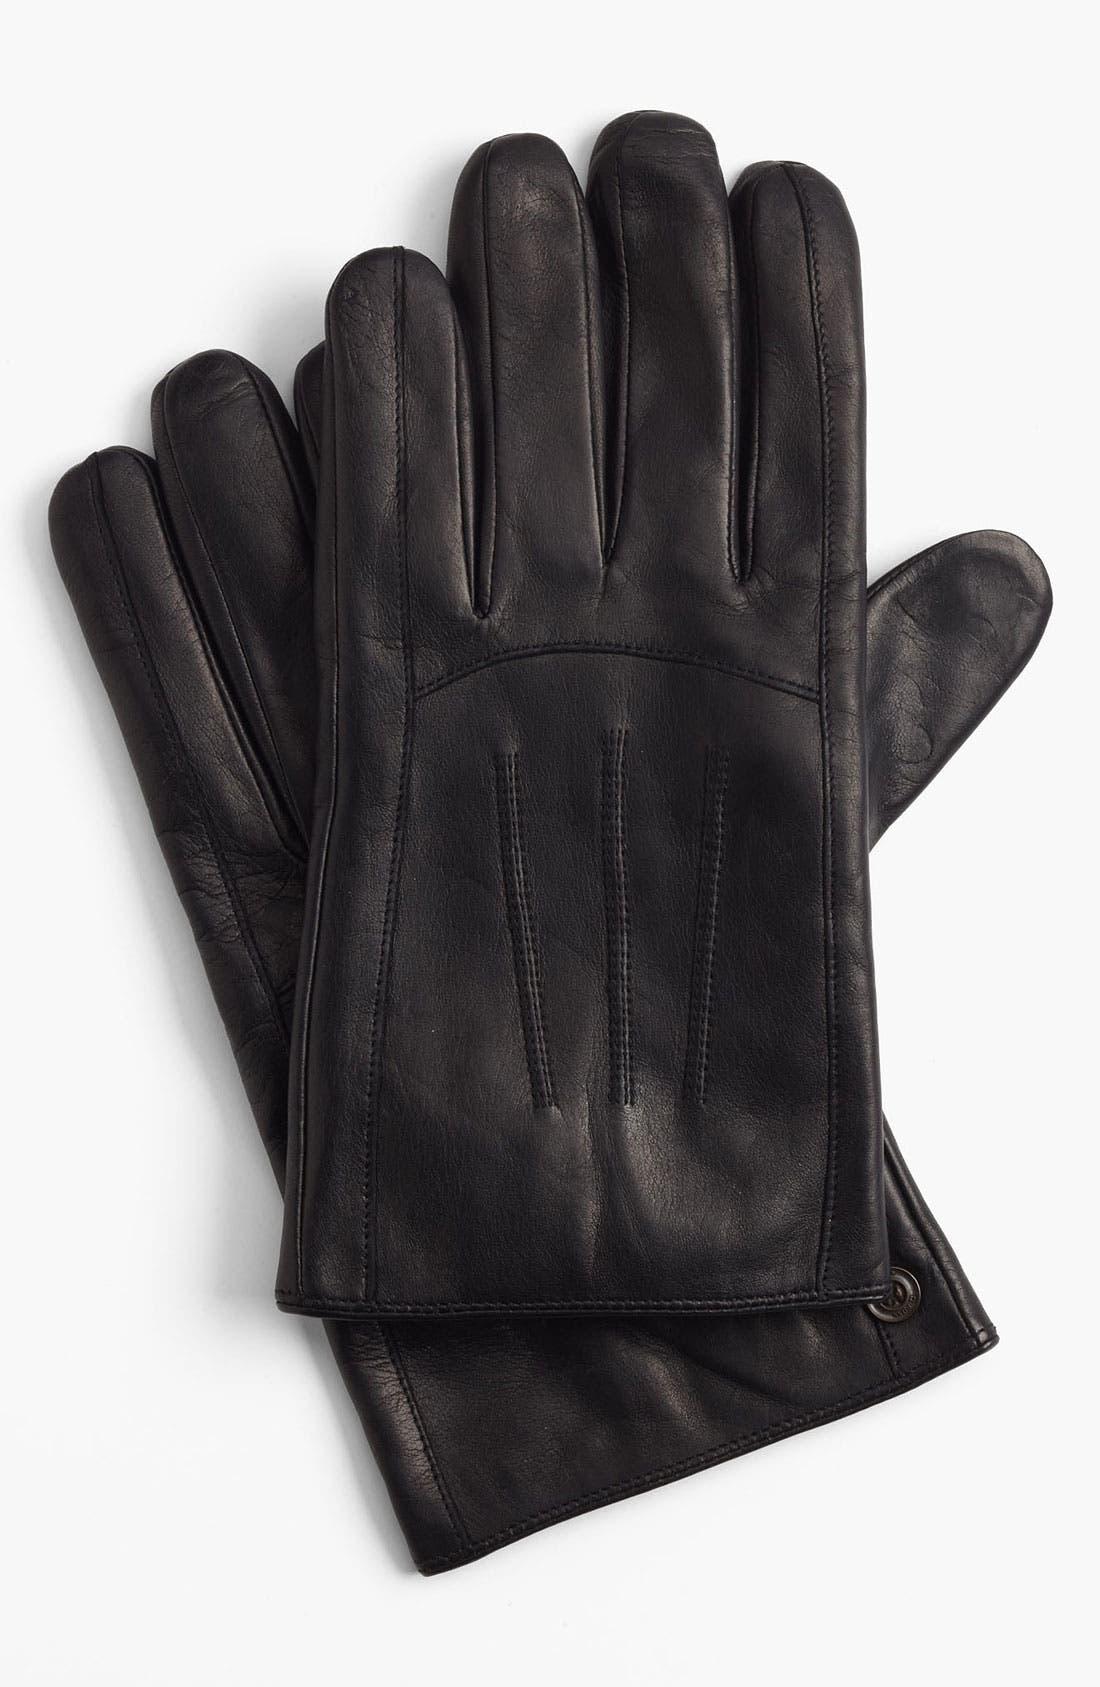 Alternate Image 1 Selected - BOSS Black 'Eru' Leather Gloves